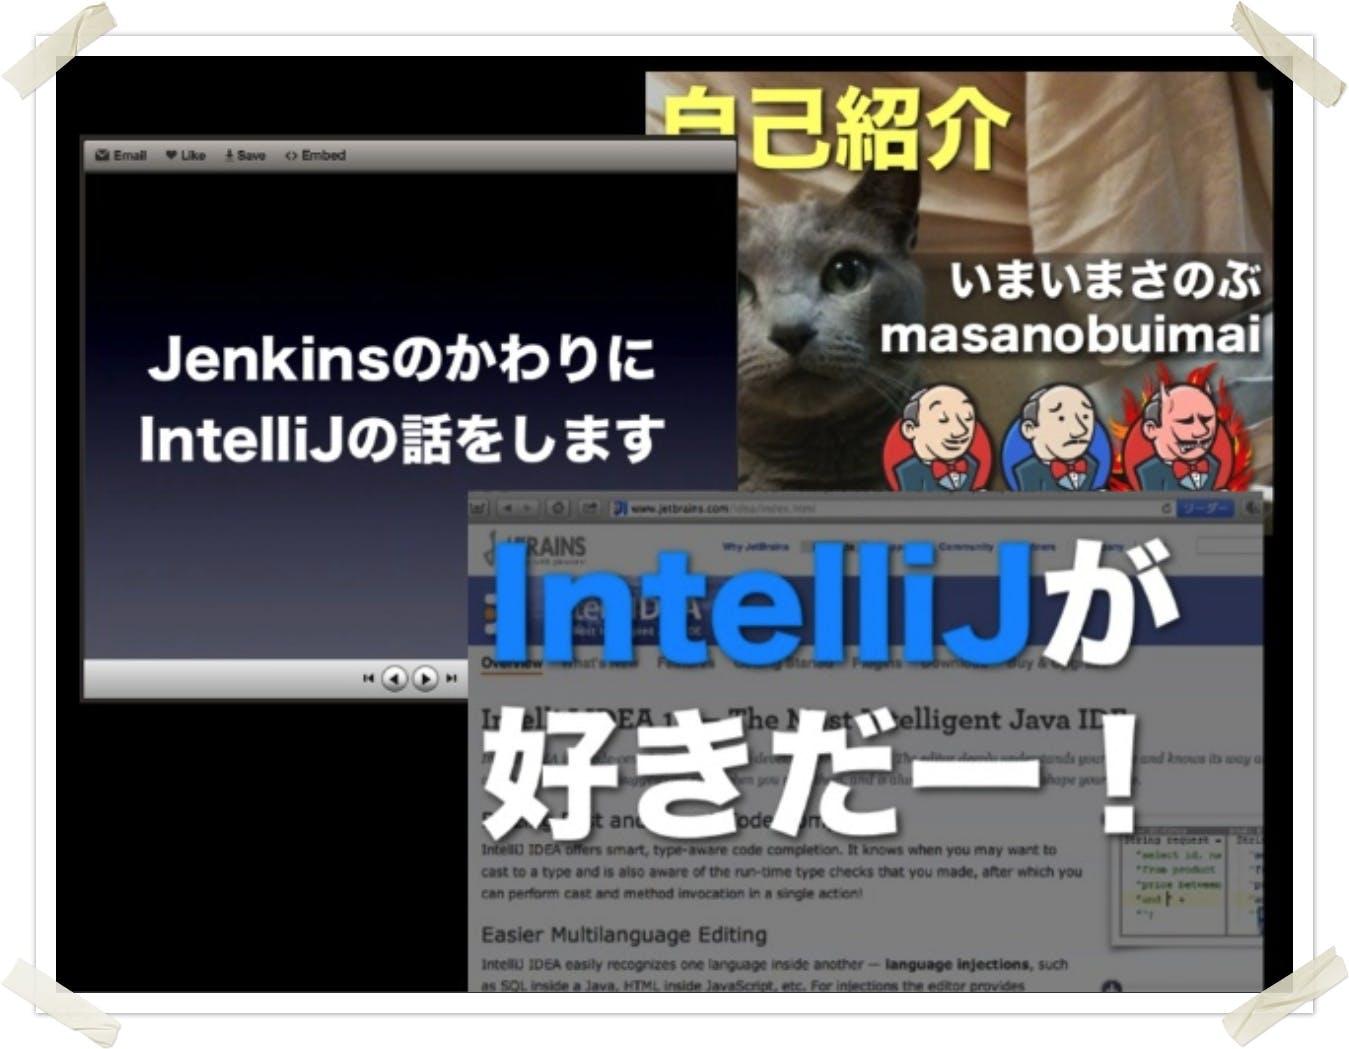 masanobuimai-intellij.jpg